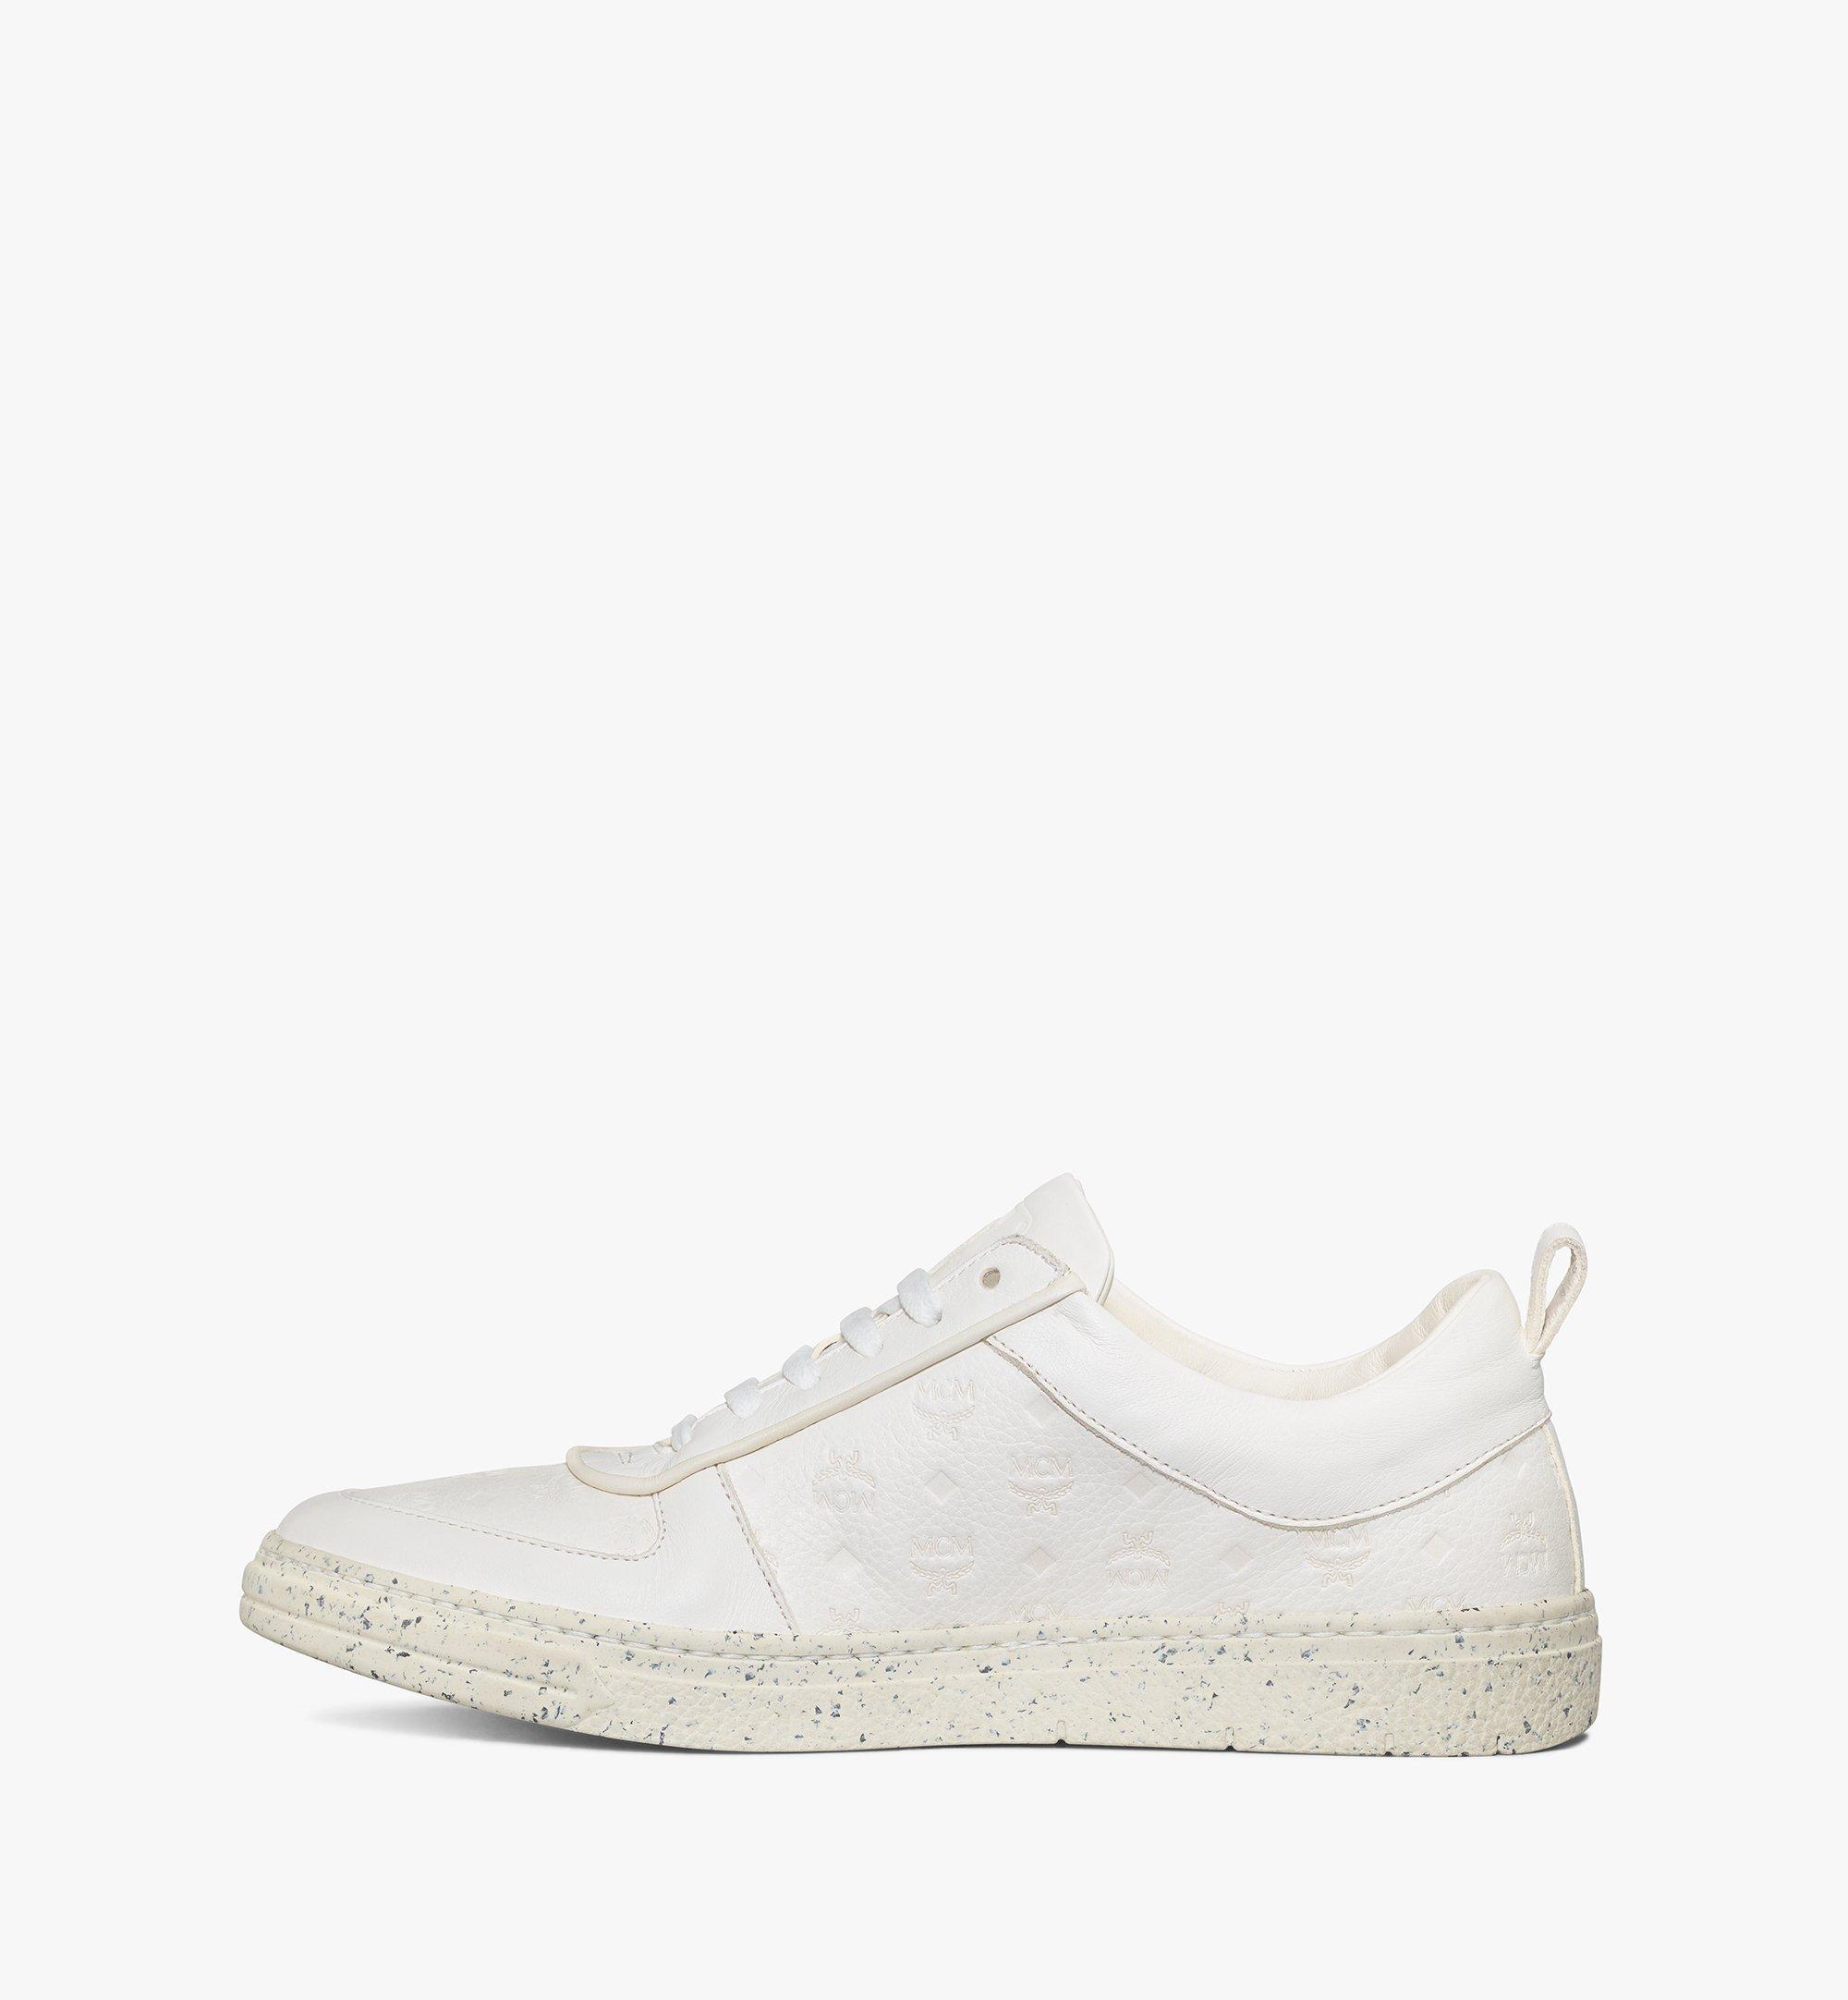 MCM รองเท้าผ้าใบสำหรับผู้หญิง Terrain Lo ผลิตจากวัสดุที่ยั่งยืน White MESAAMM18WT036 มุมมองอื่น 1